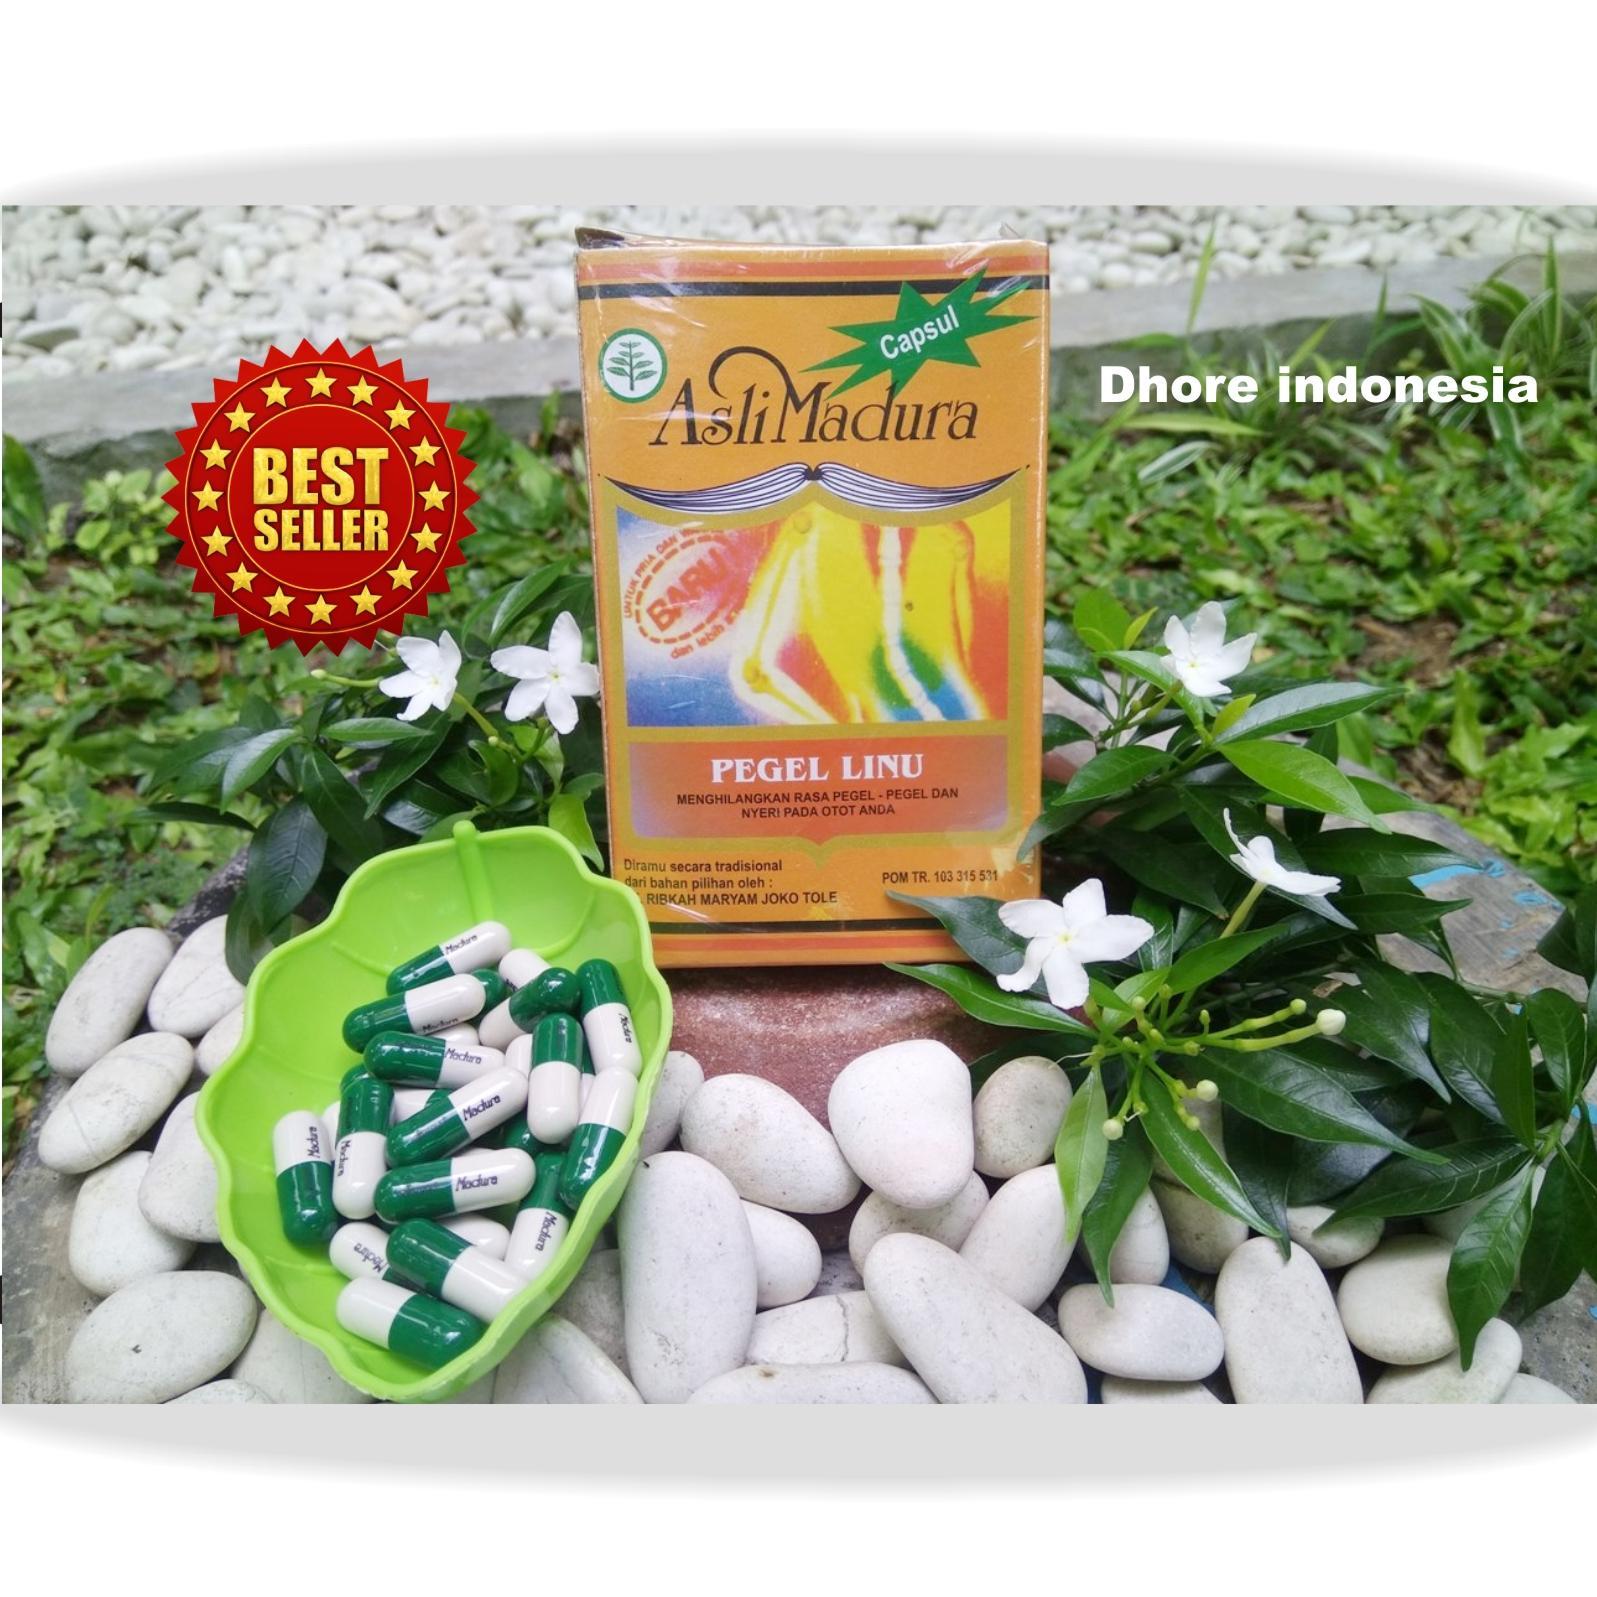 Buy Sell Cheapest Jamu Pegel Linu Best Quality Product Deals Zam Obat Asam Urat Pegal Dan Encok Nyeri Badan Madura Tubuh Rematik